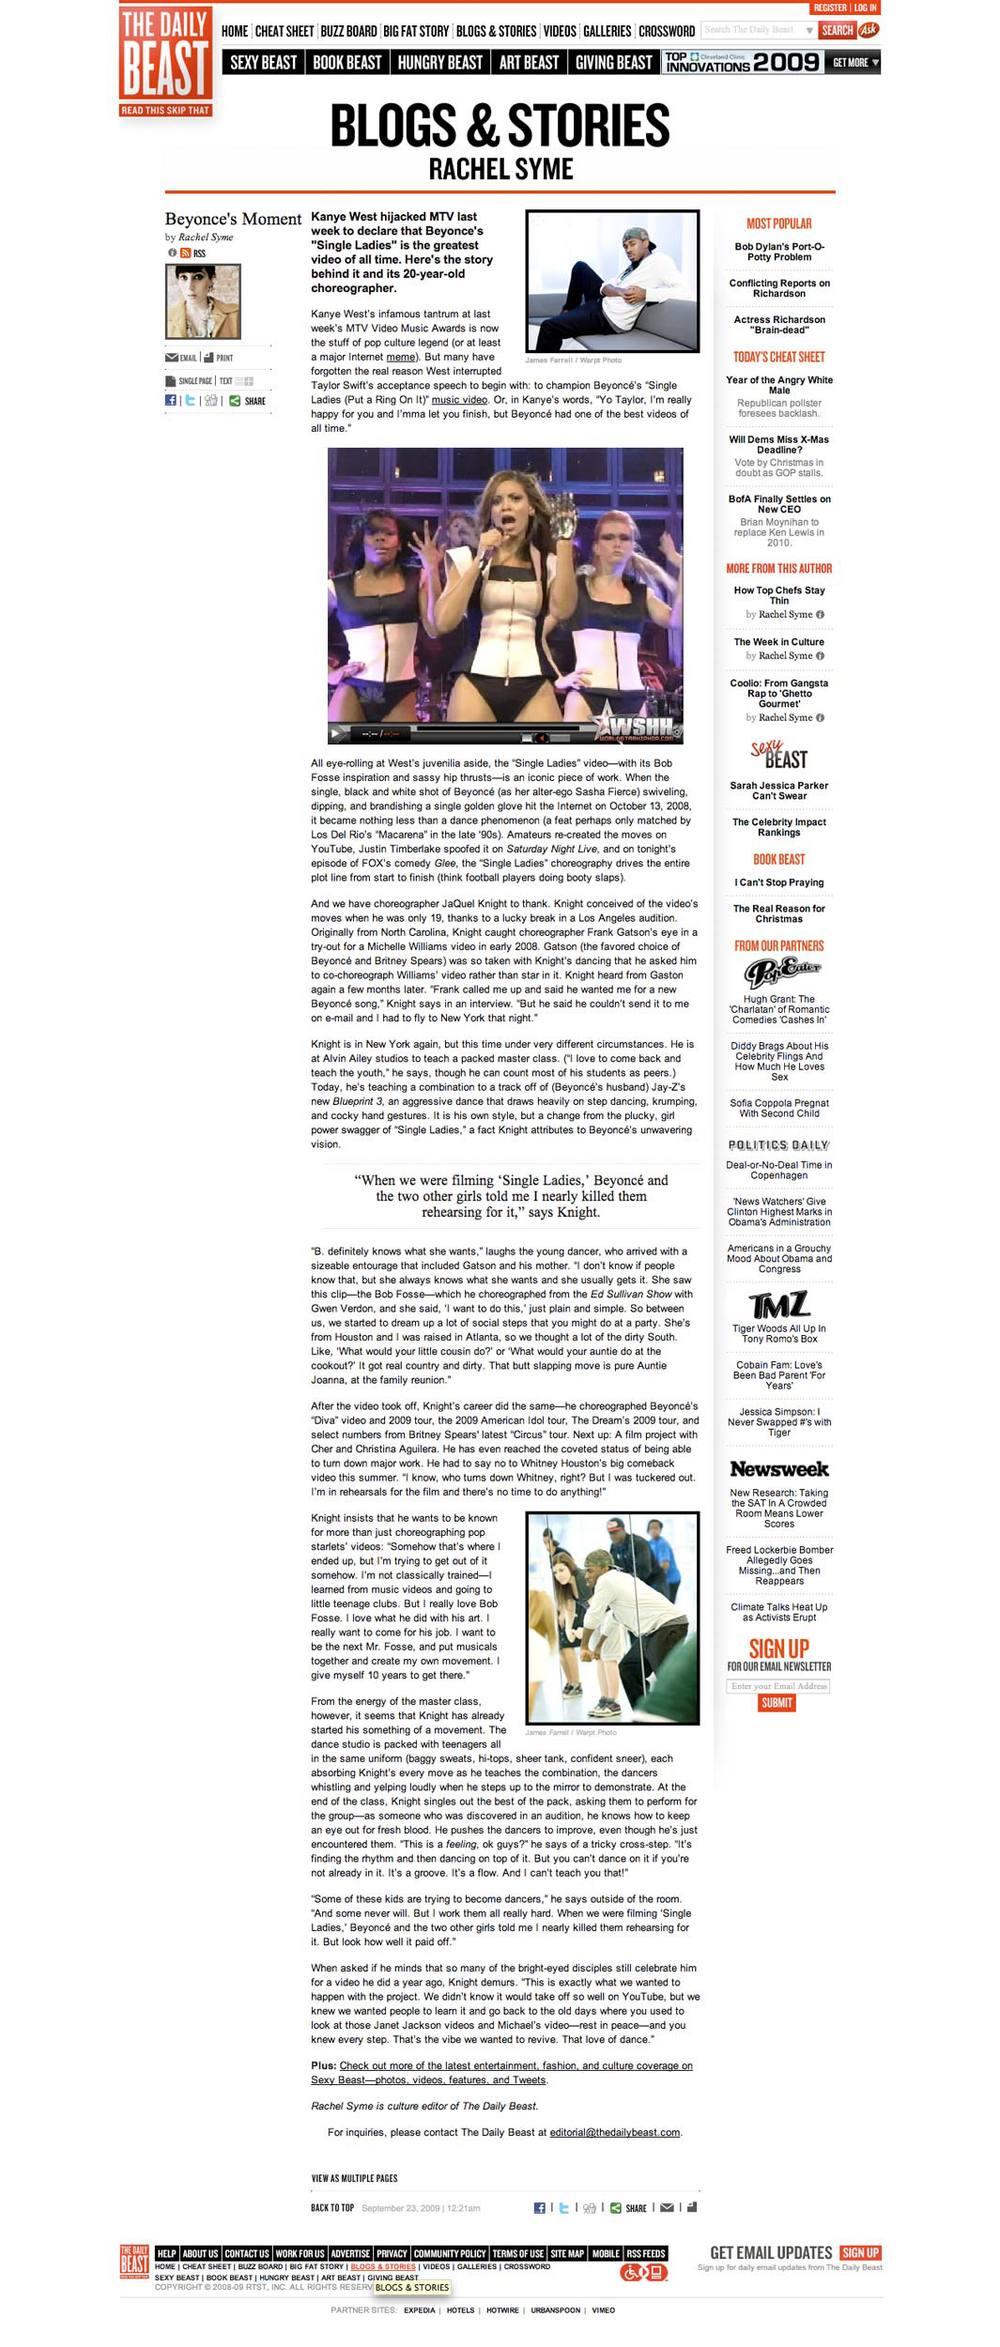 Daily-Beast-Article-WEB.jpg